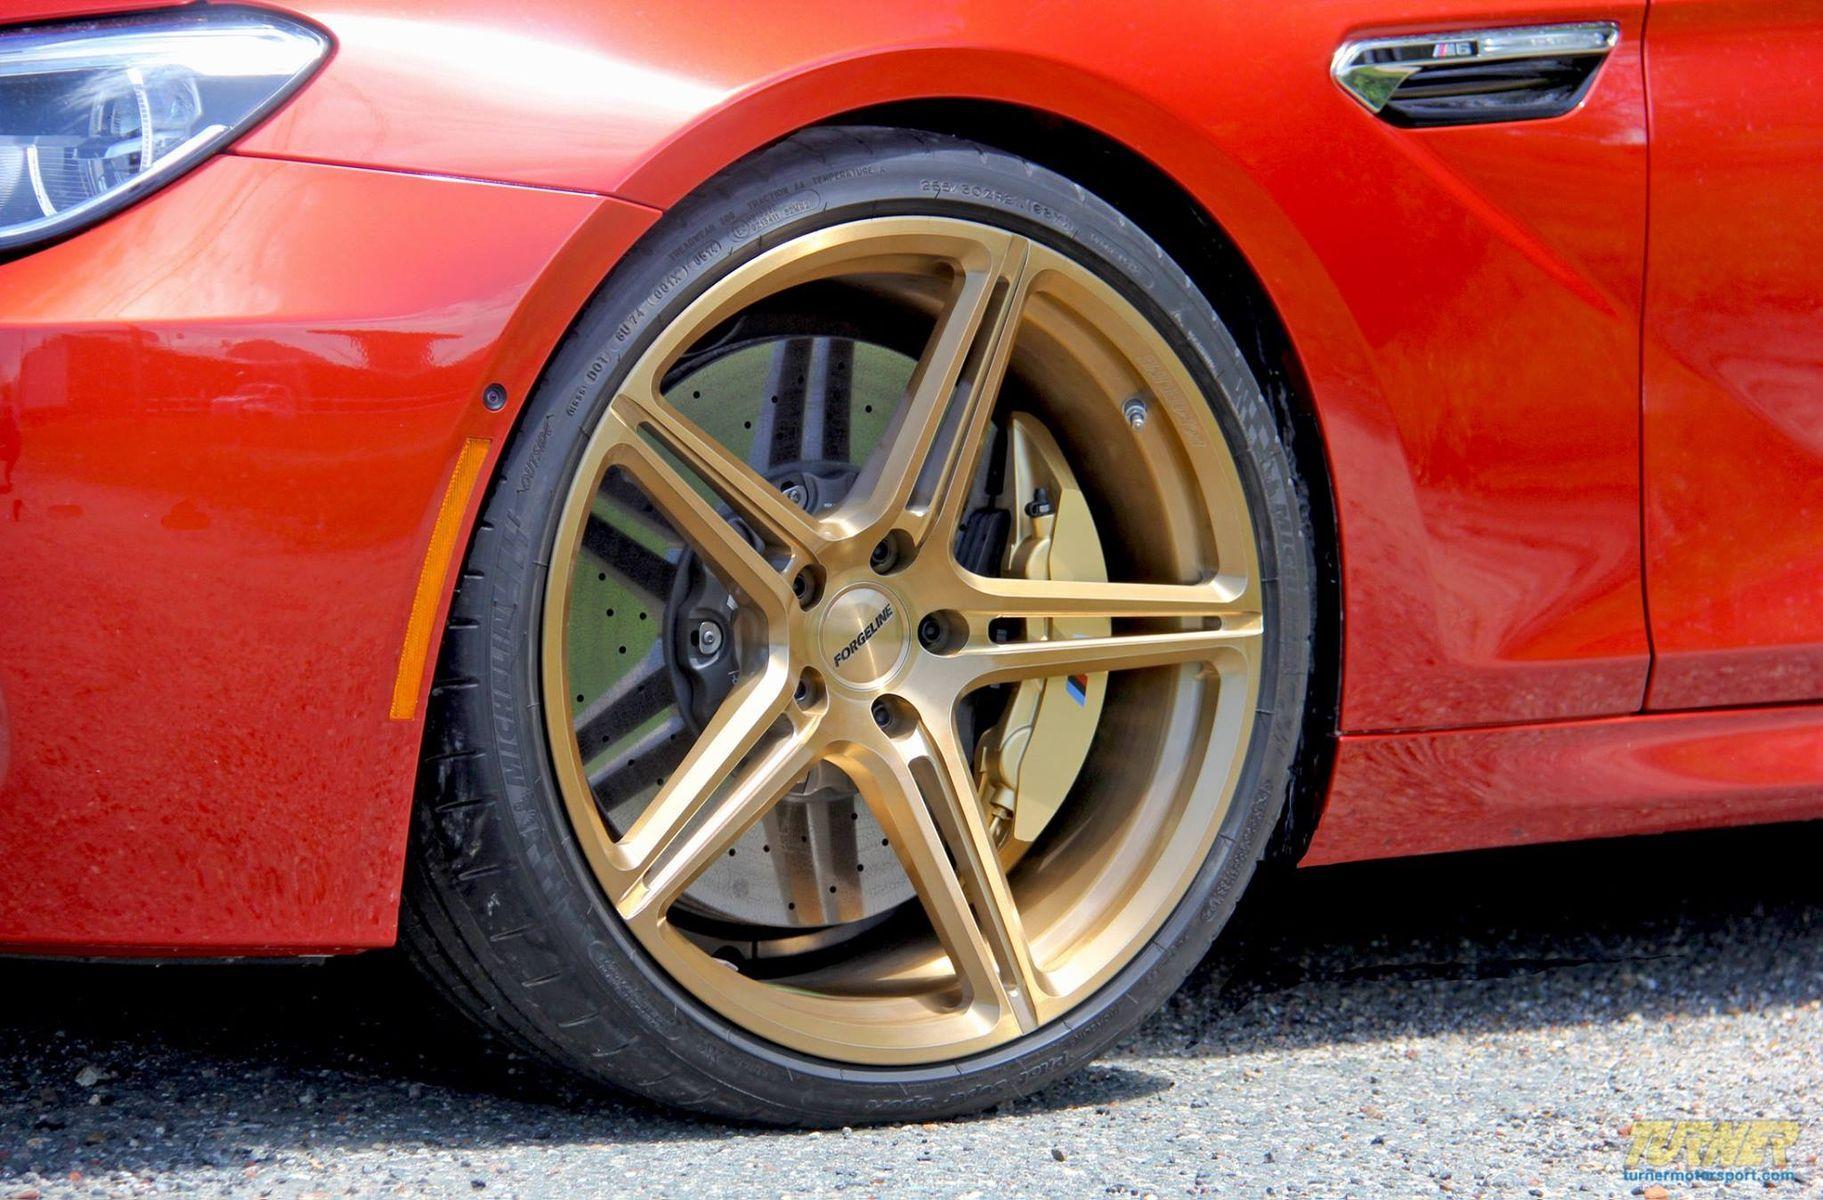 2015 BMW M6 | Turner Motorsport's BMW F13 M6 on Forgeline One Piece Forged Monoblock SC1 Wheels